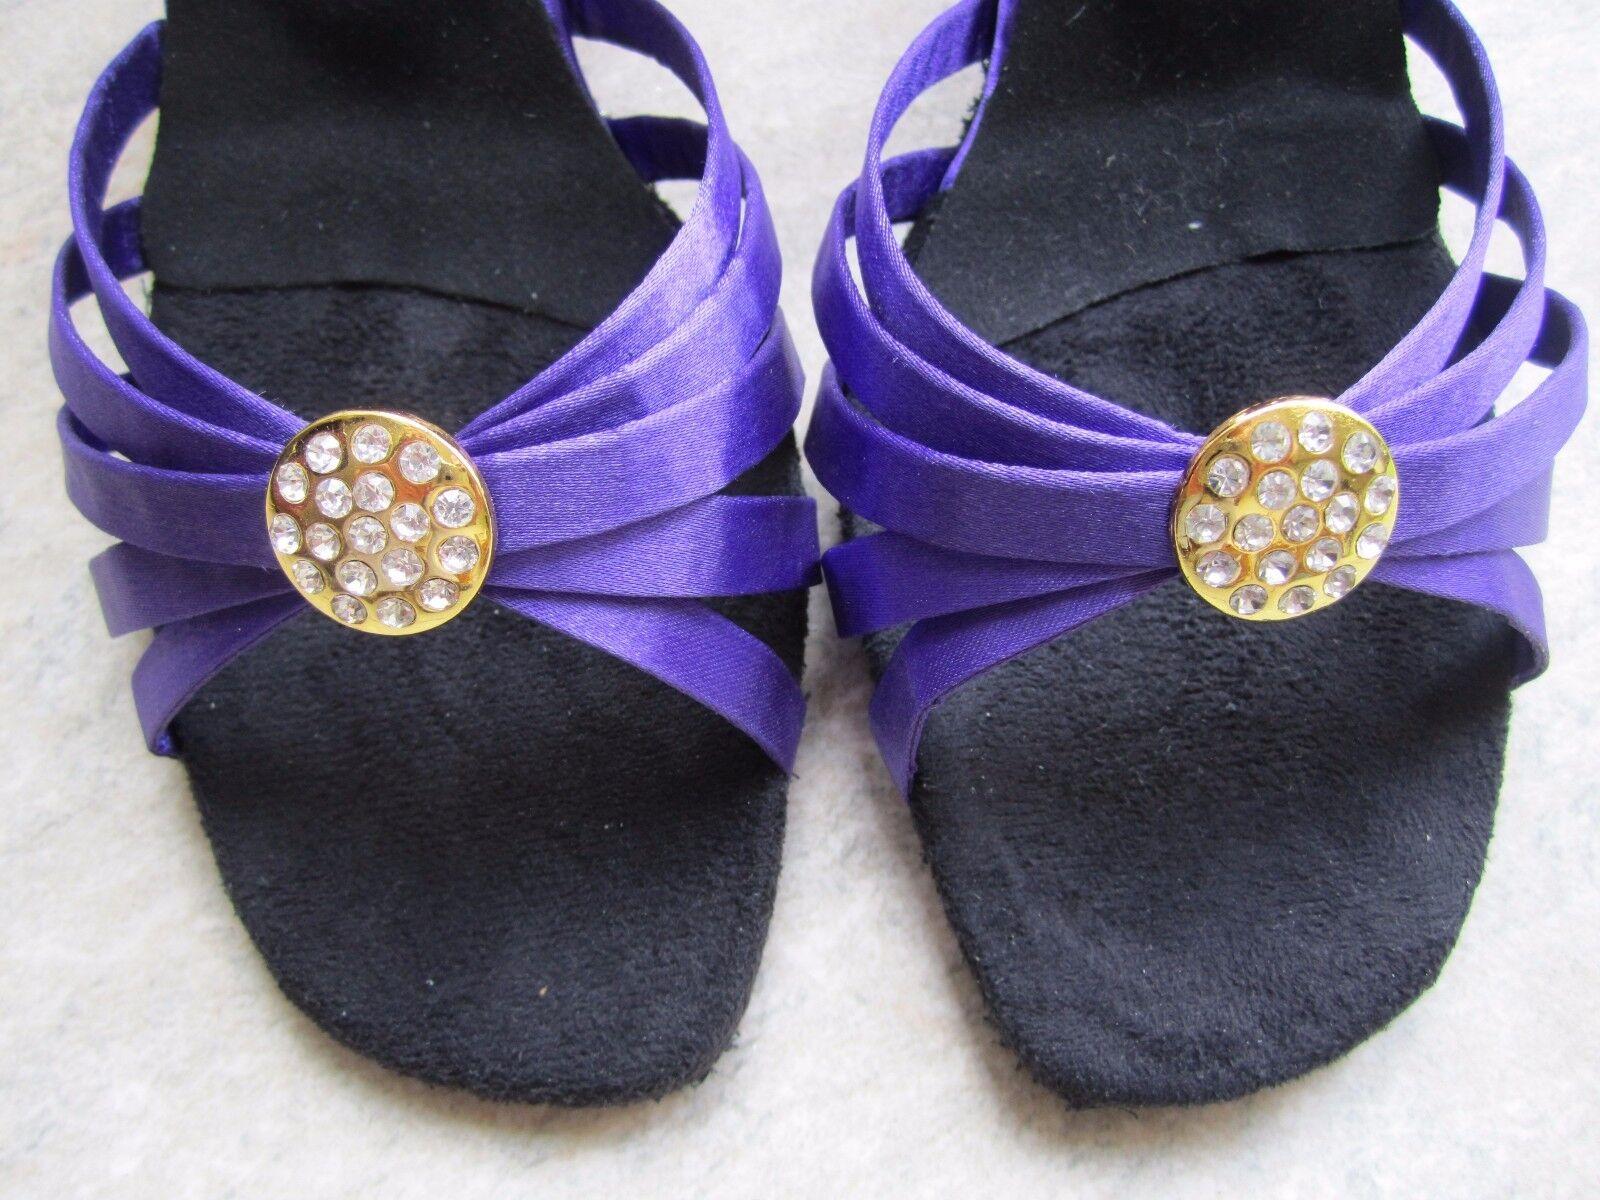 Ladies UK Size 6 Purple Satin Ballroom Sandals with 2.5